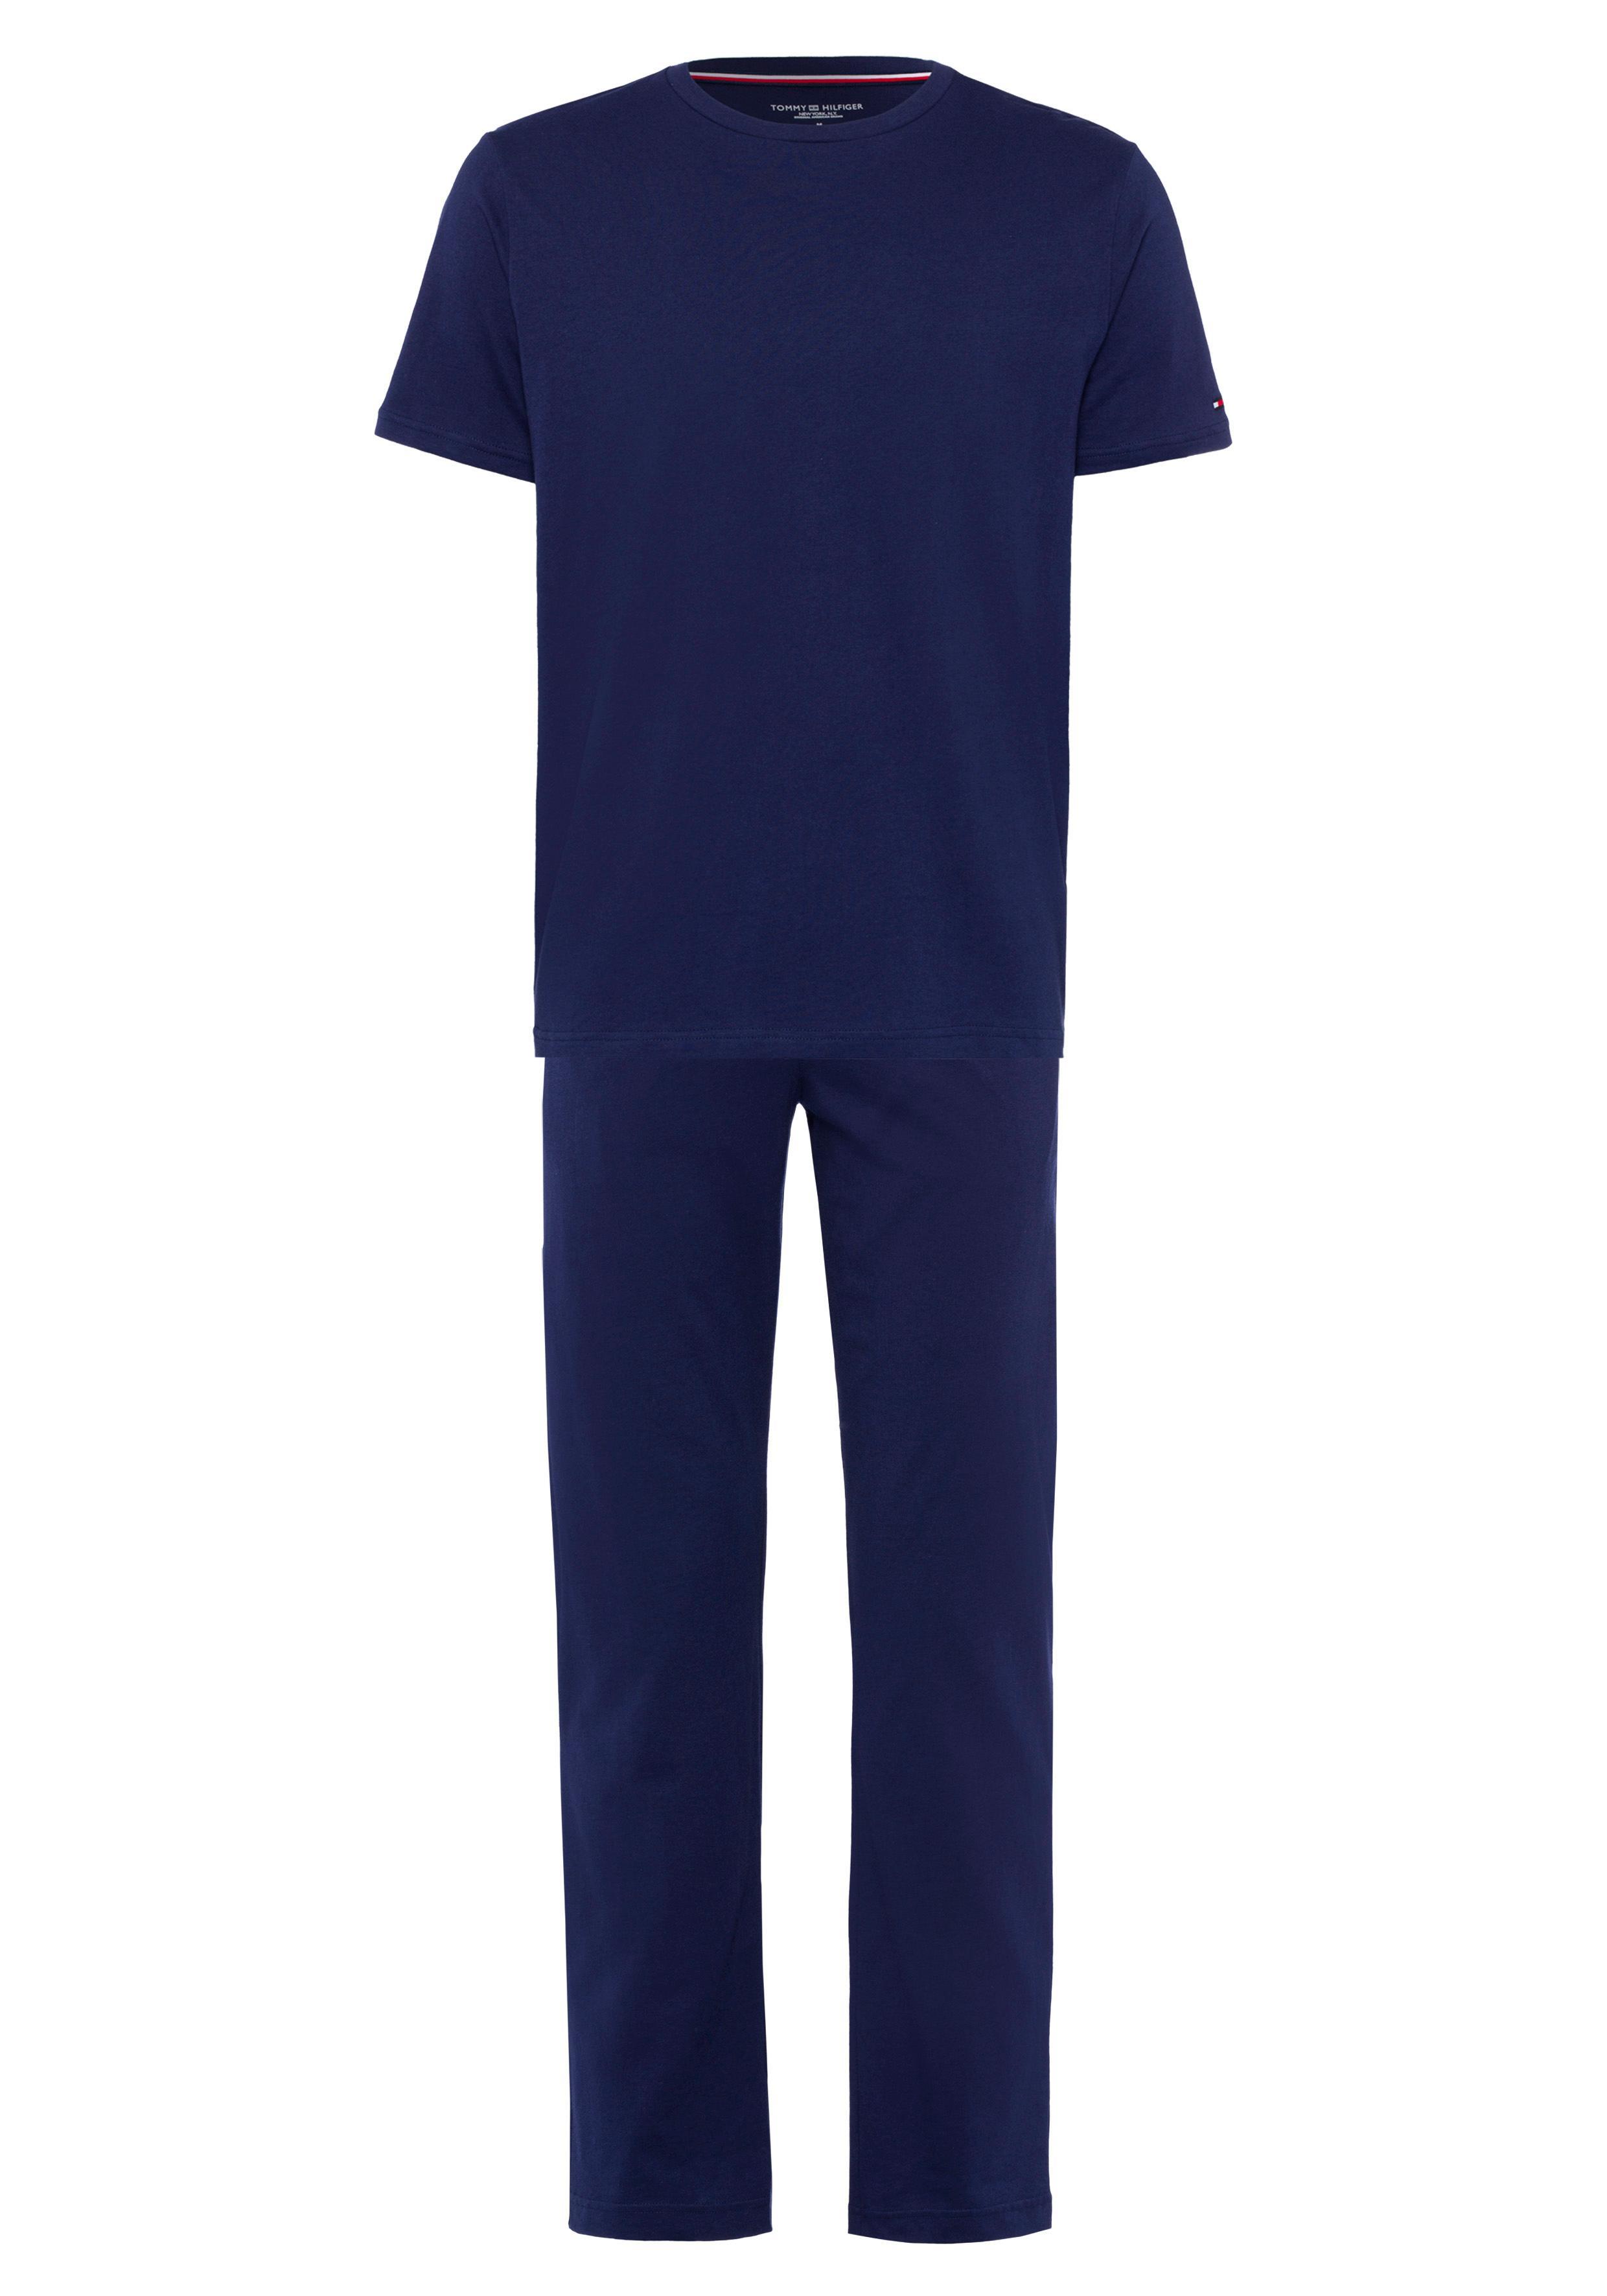 TOMMY HILFIGER Pyjama